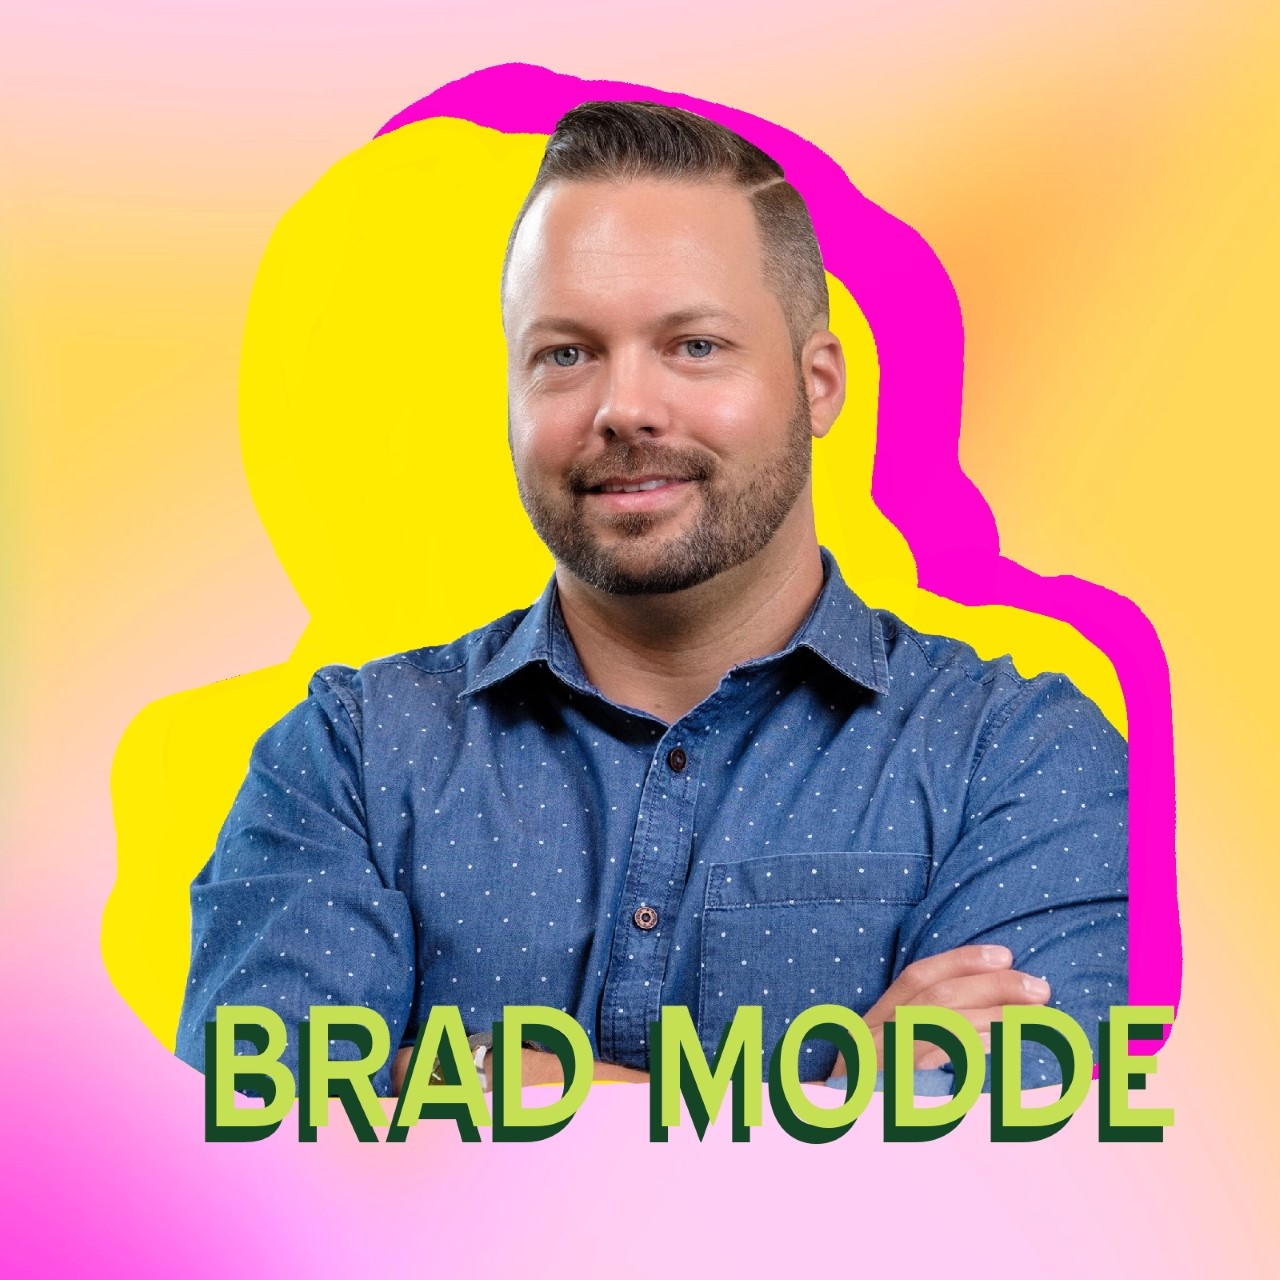 """Brad Modde"" superimposed over his headshot"